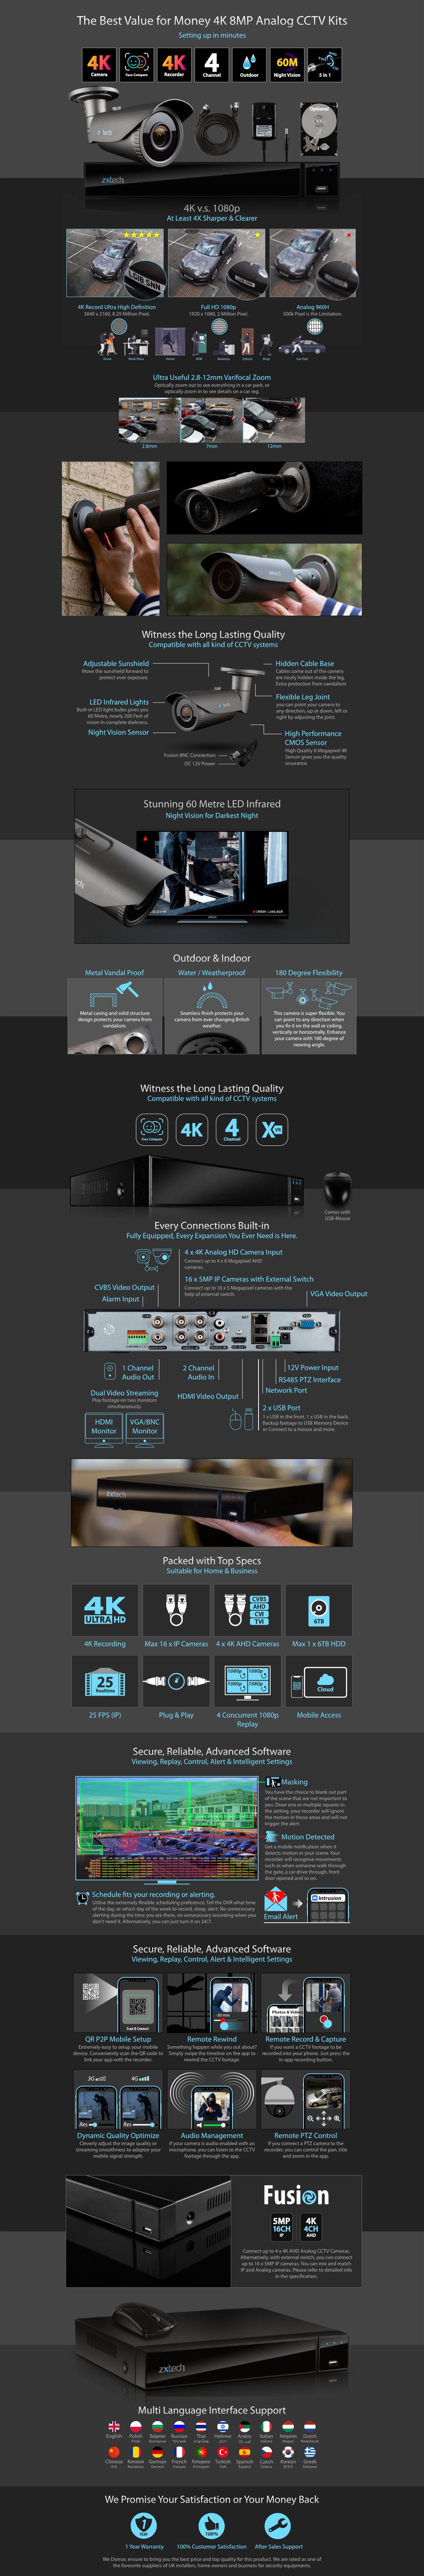 Zxtech 4x 8MP 4K-Lite UHD 60M Night Vision 2.8-12mm Varifocal Bullet Cameras 4CH DVR CCTV Kit | AX4G4Z